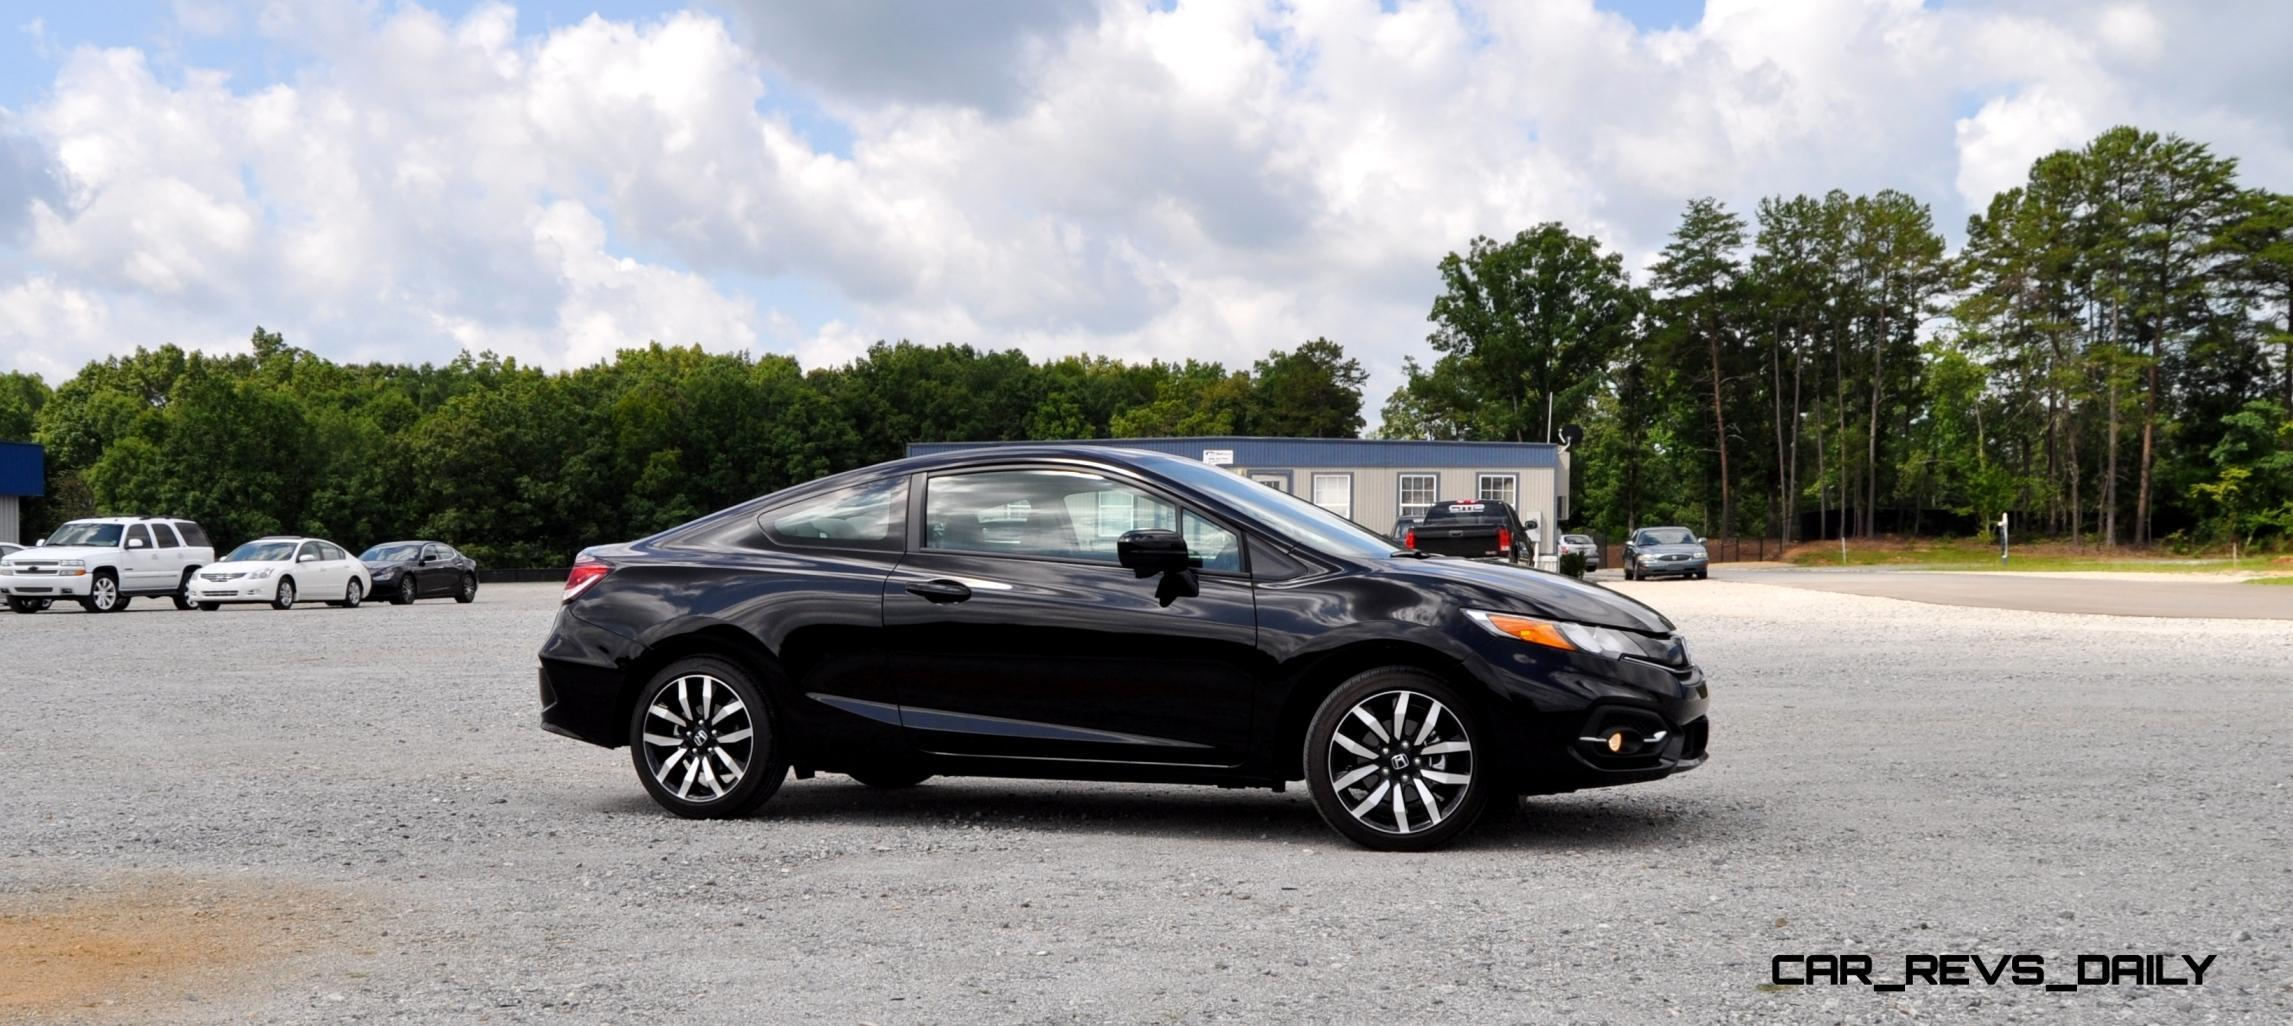 Road test review 2014 honda civic ex l coupe 9 for Honda civic ex 2014